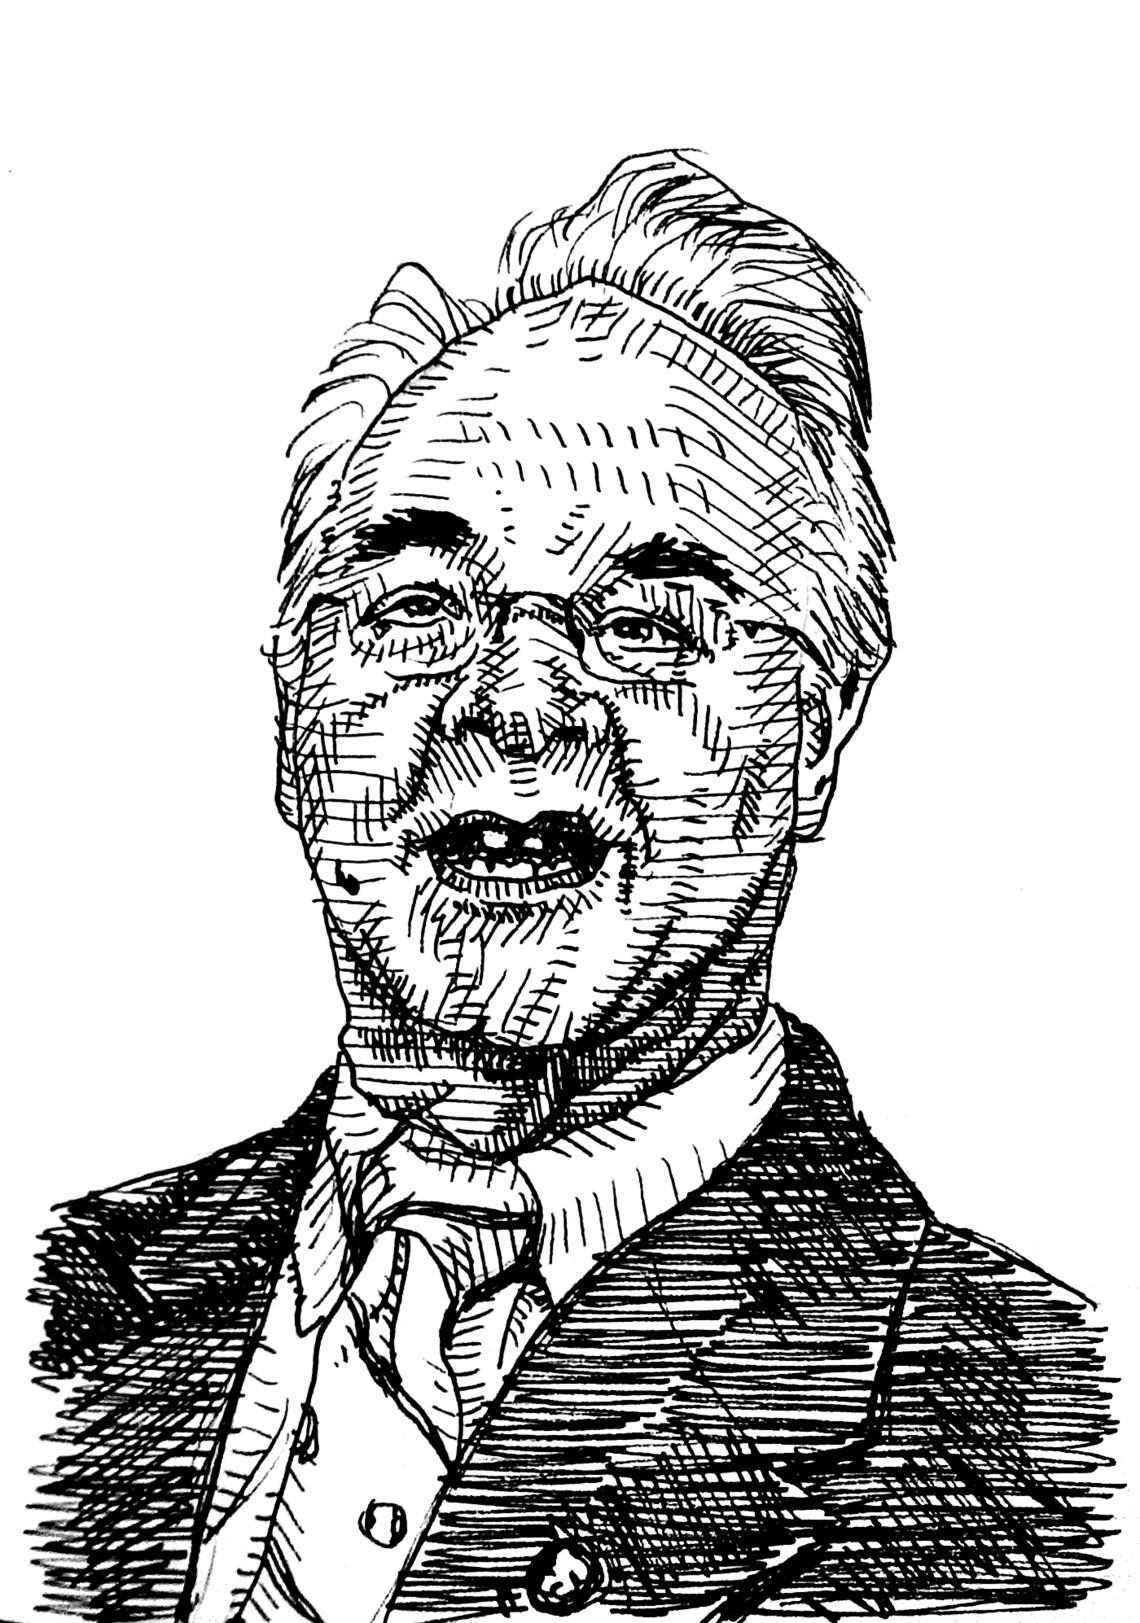 Tom Price illustration